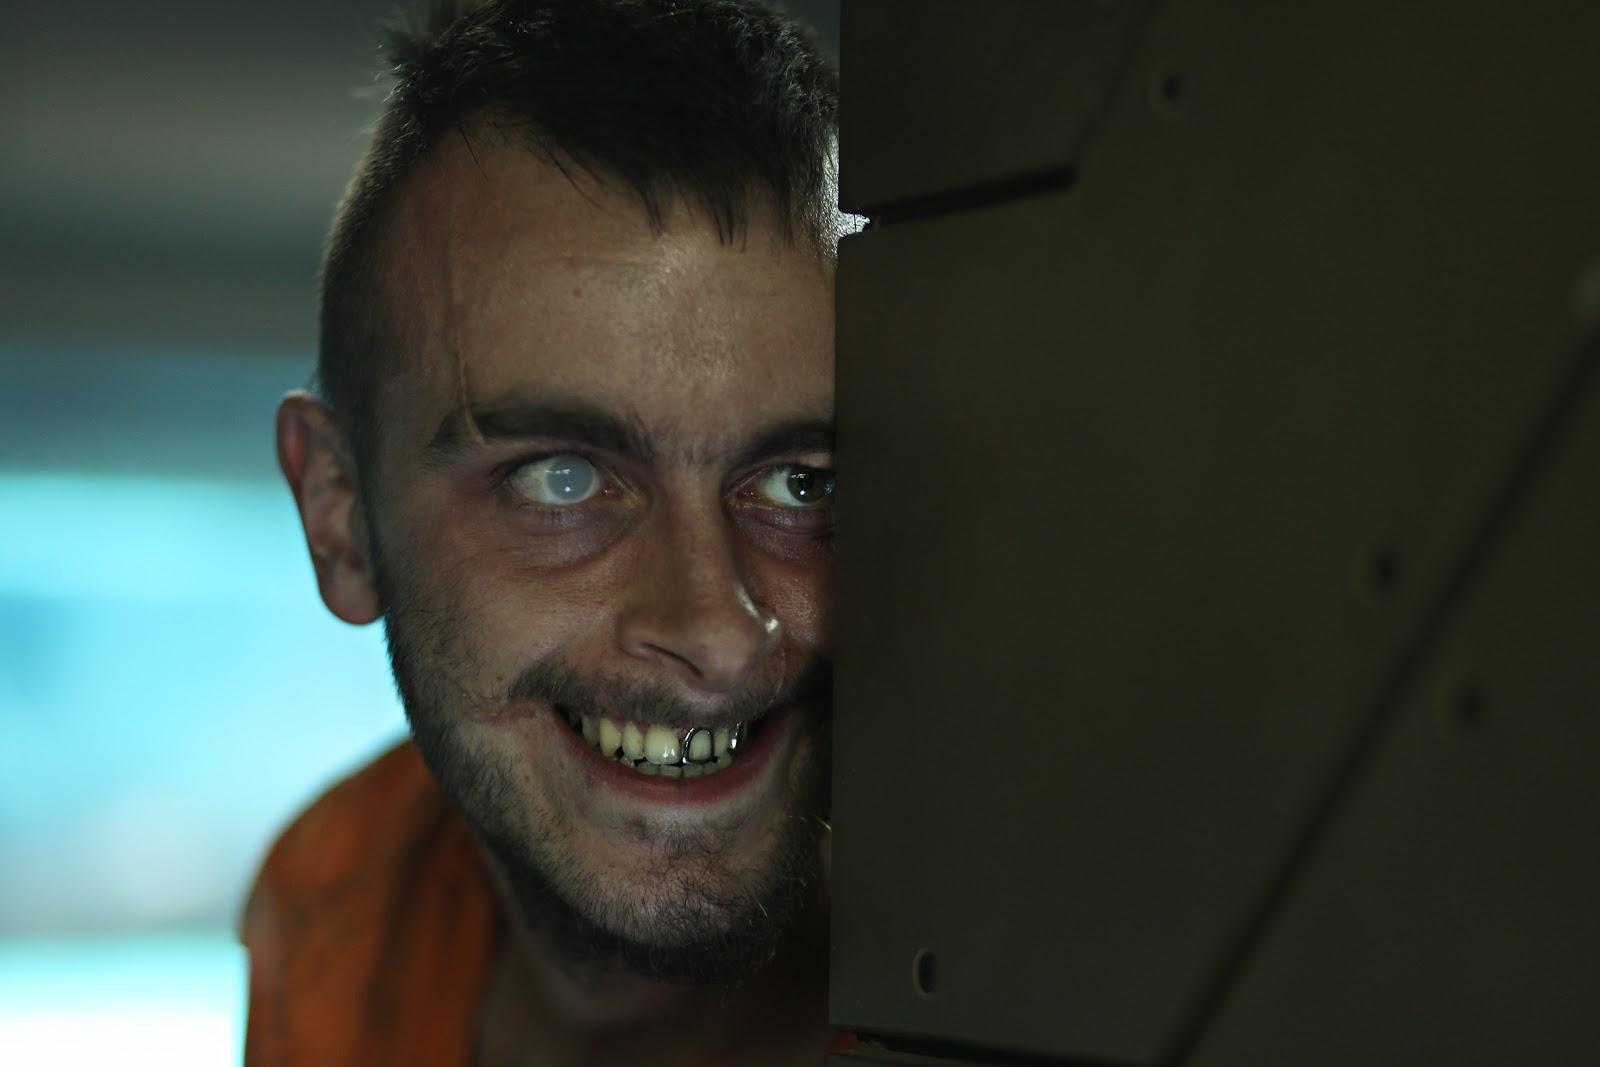 Nawak - Page 4 Lockout-image+hydell+psycho+inmate